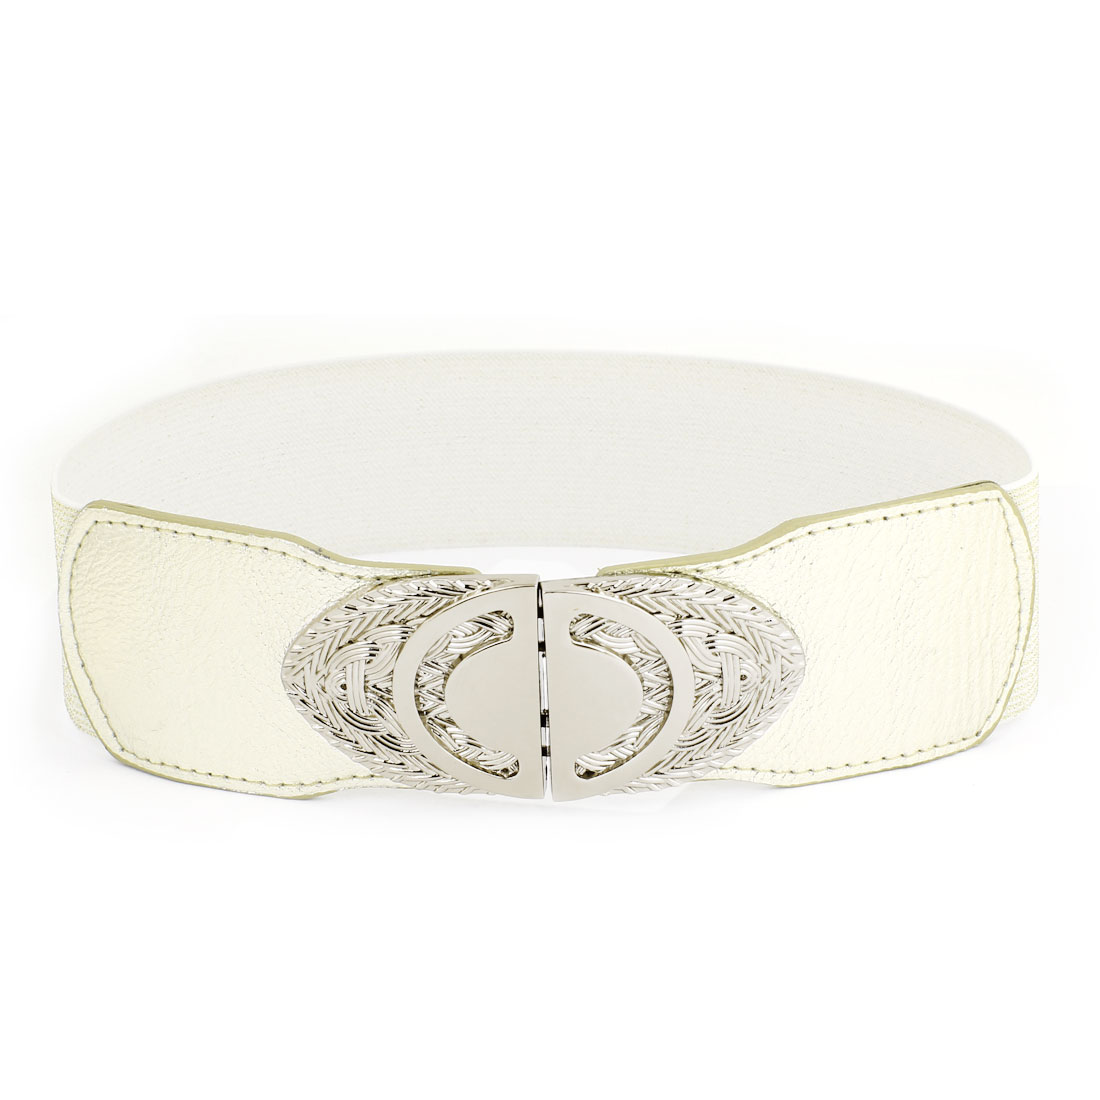 Gary Oval Interlocking Buckle Elastic Fabric Waist Cinch Belt Gold Tone for Women